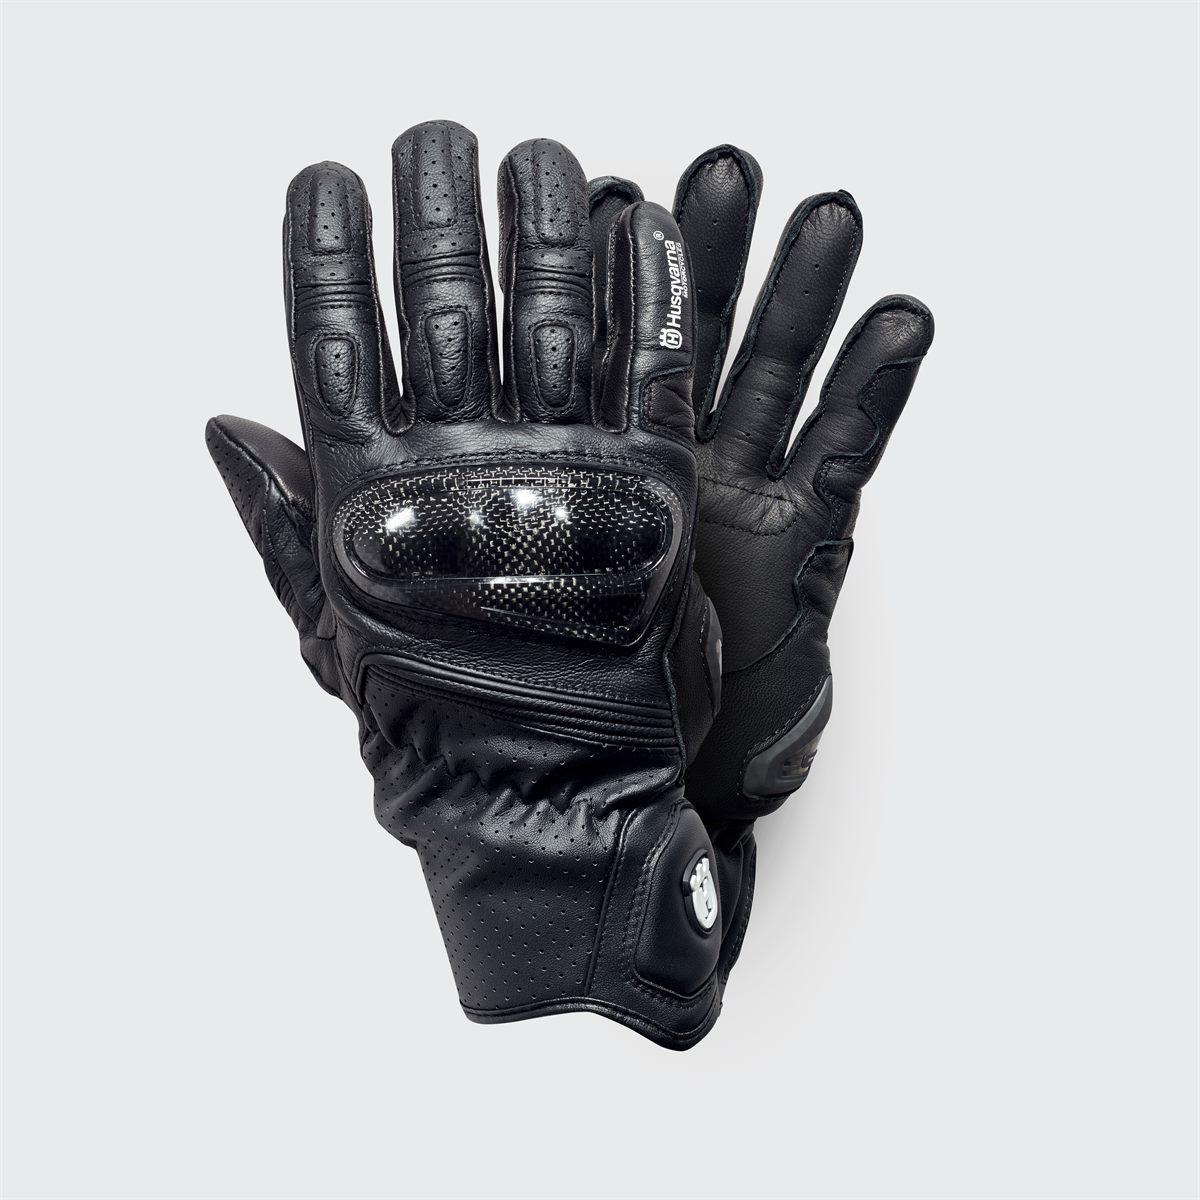 Husqvarna Motorcycles Present 2019 VITPILEN & SVARTPILEN Clothing Collection - PILEN GLOVES